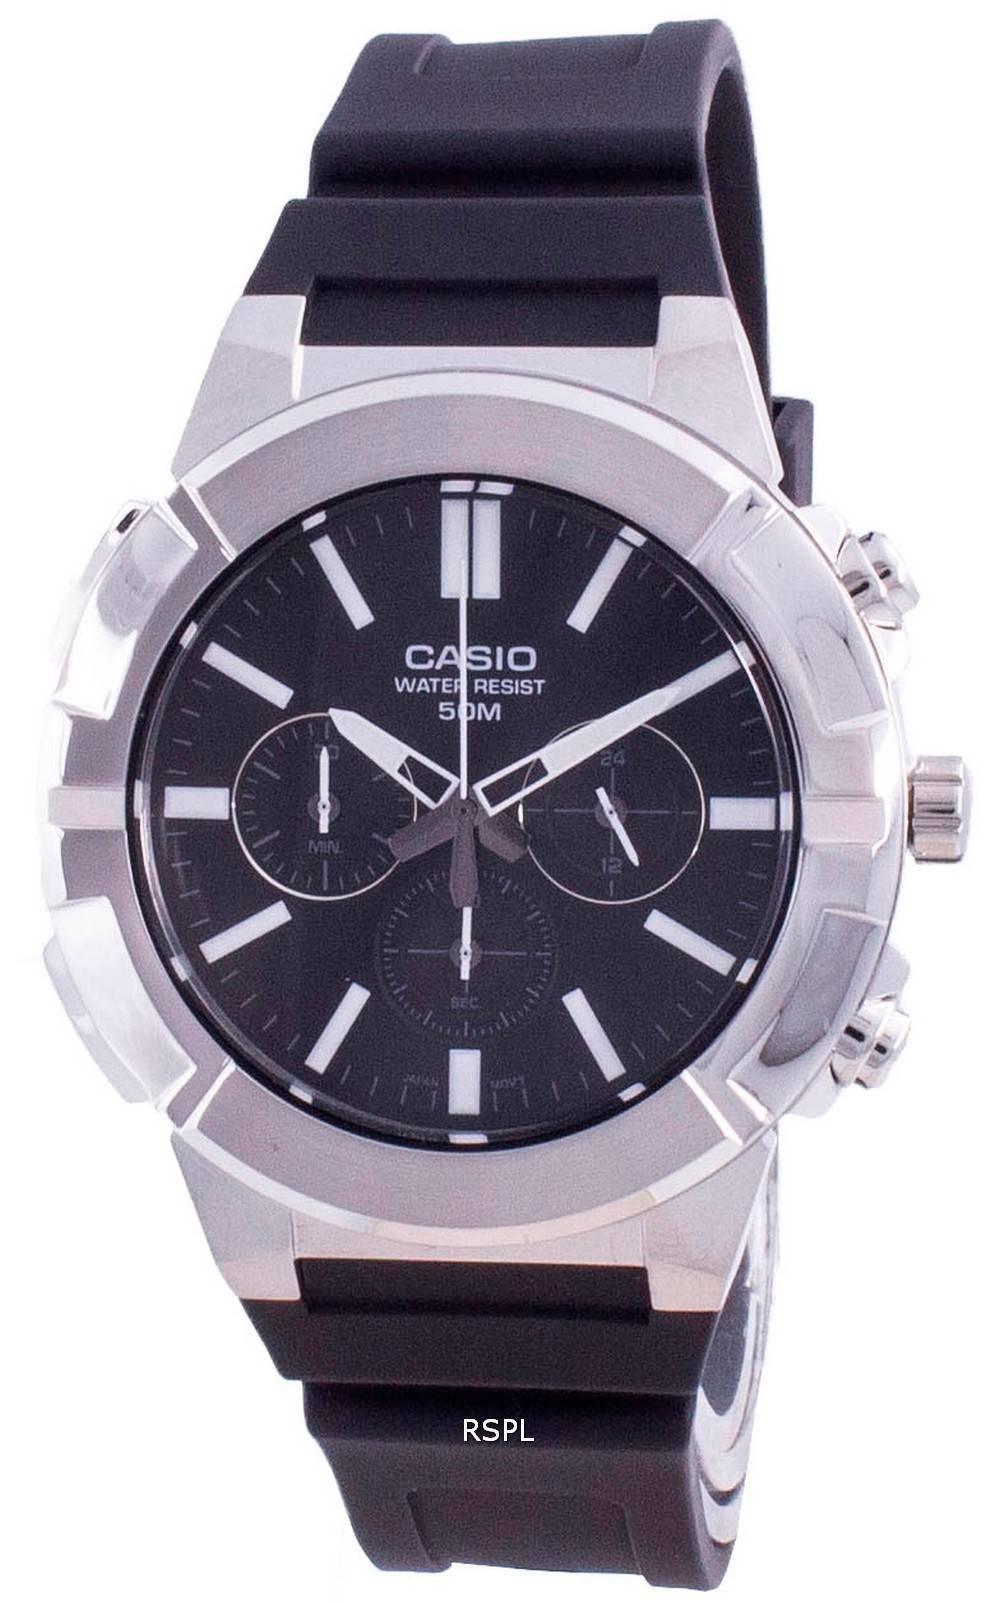 Casio Multi Zeiger Analog Quarz Chronograph MTP-E500-1A MTP-E500-1 Herrenuhr